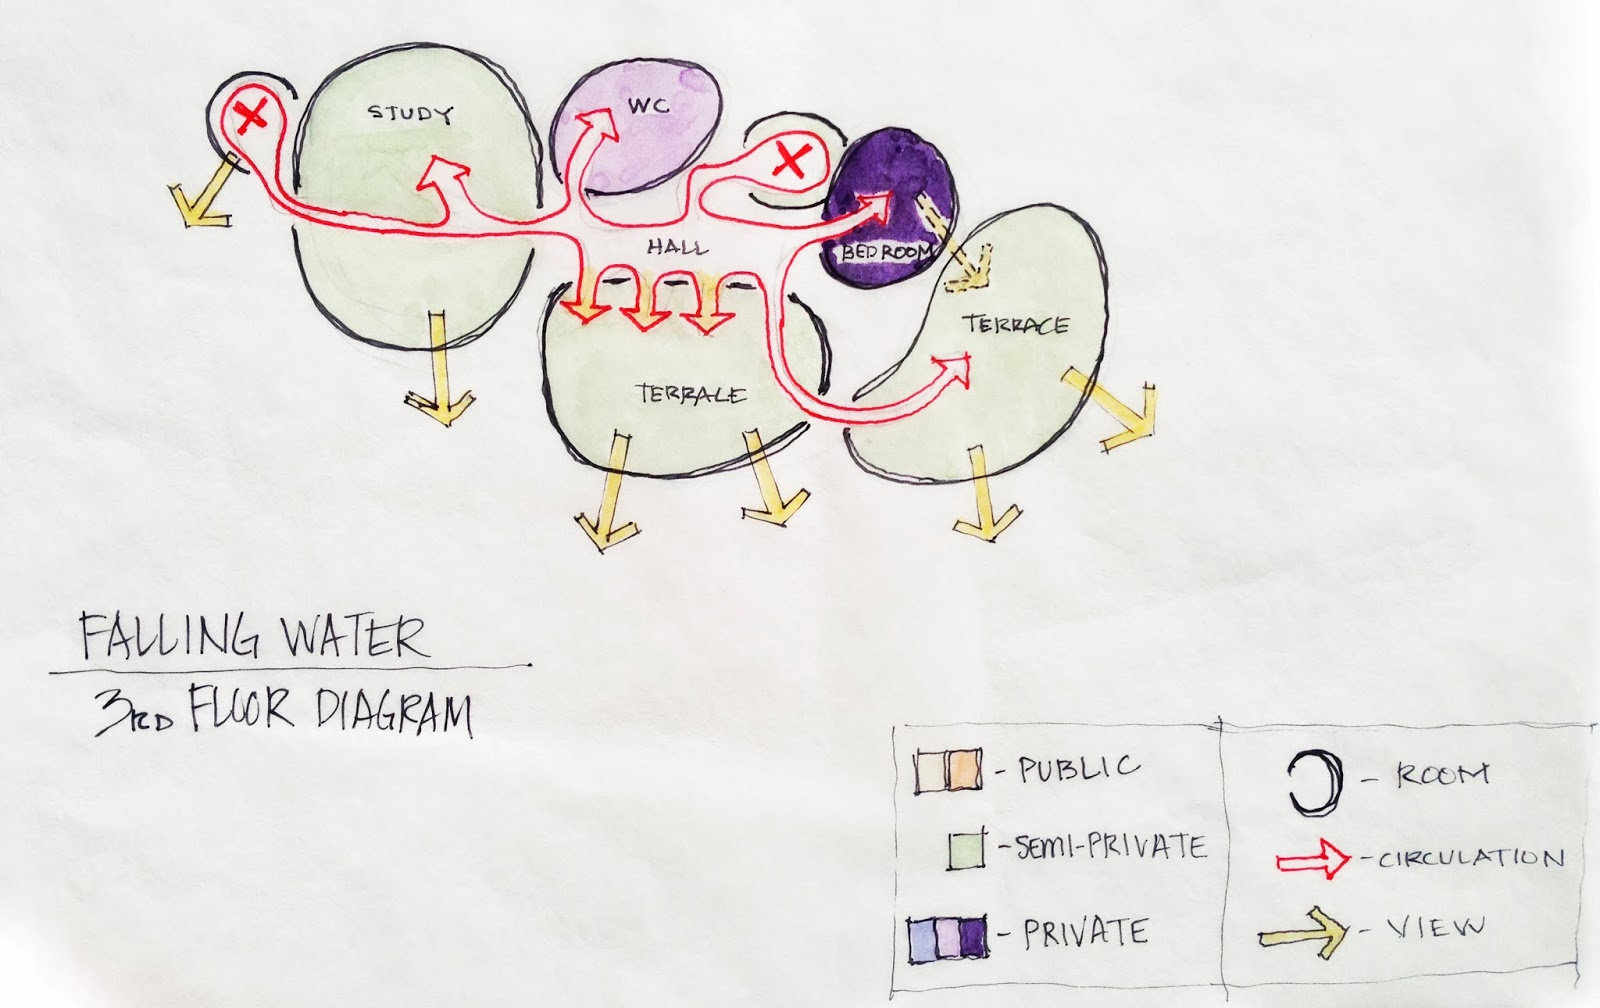 bubble diagramming arch3510 sp14 cook. Black Bedroom Furniture Sets. Home Design Ideas